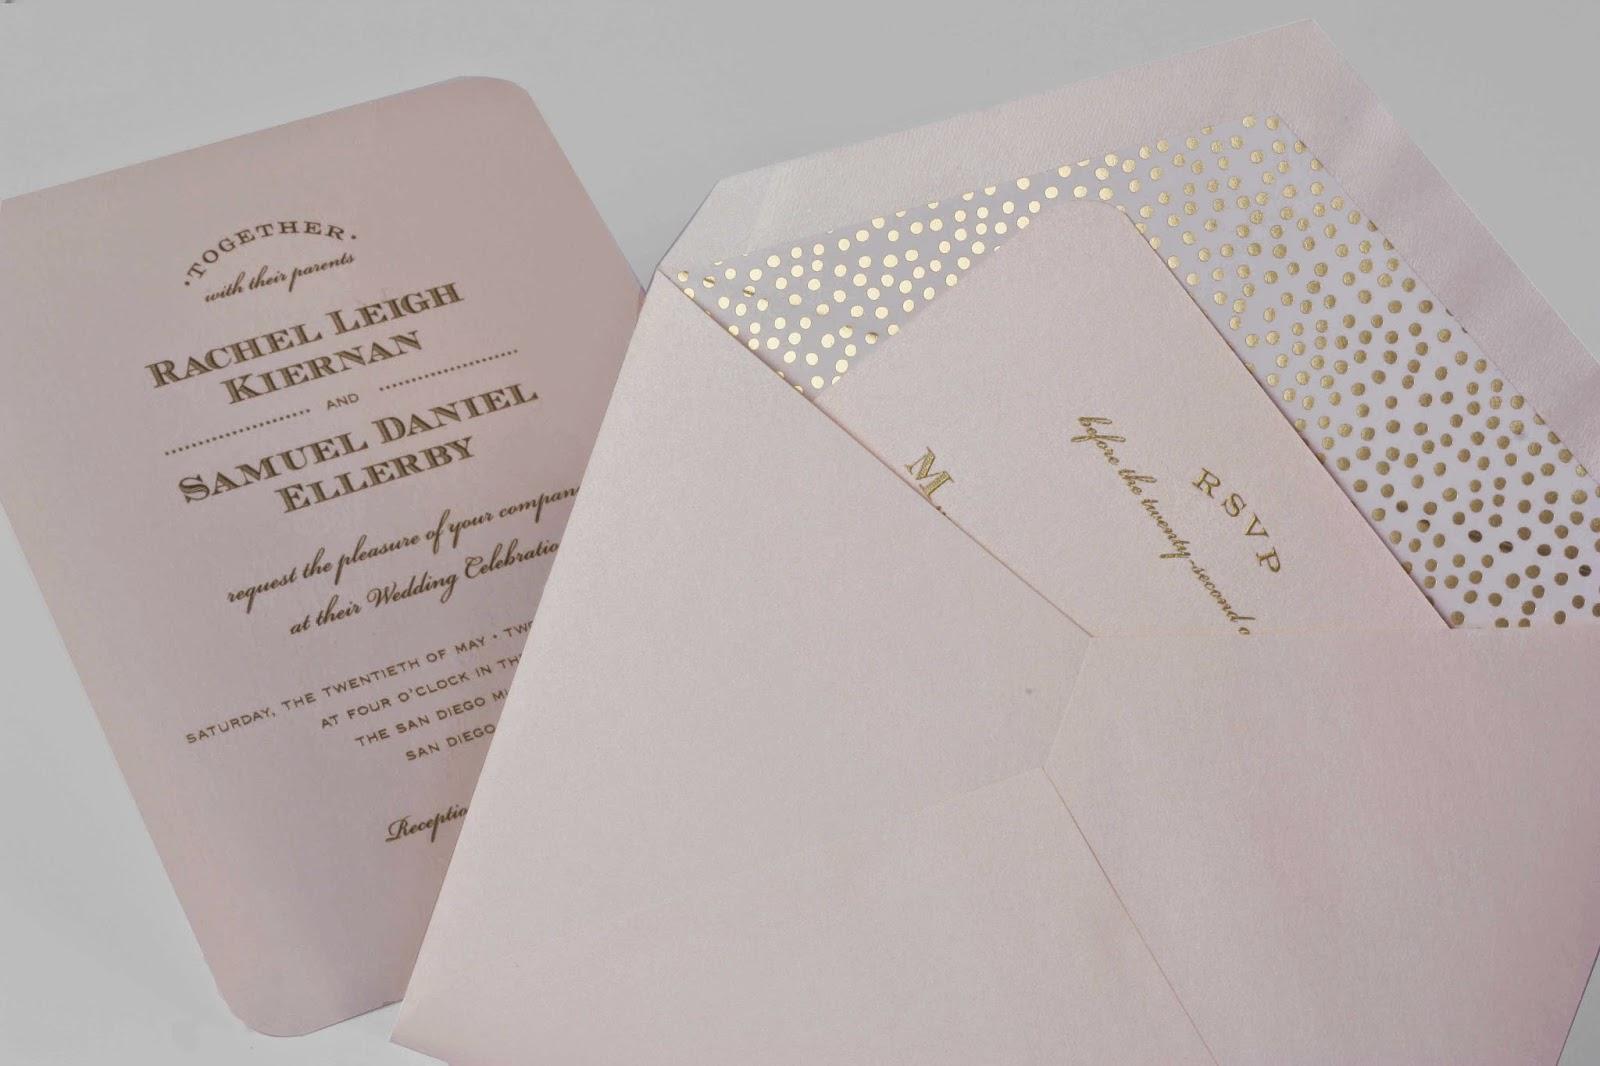 New Wedding Invitation Designs: William Arthur Blog: Delightful New Wedding Invitation